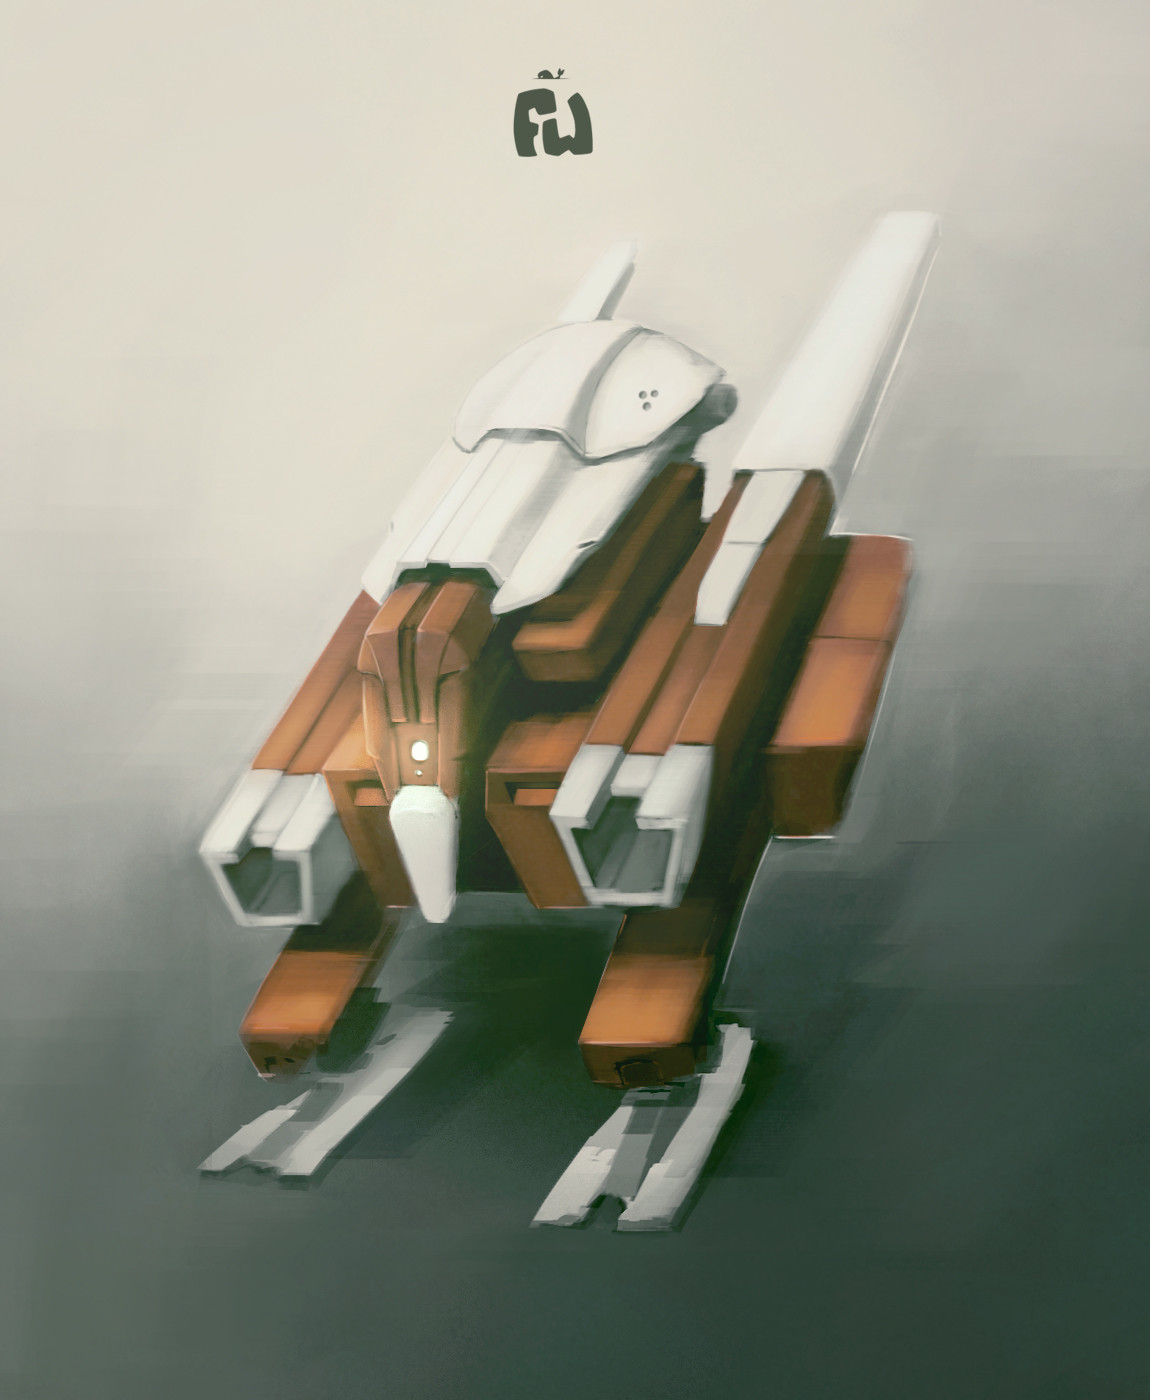 001 Machine, Alexandr Gorbunov